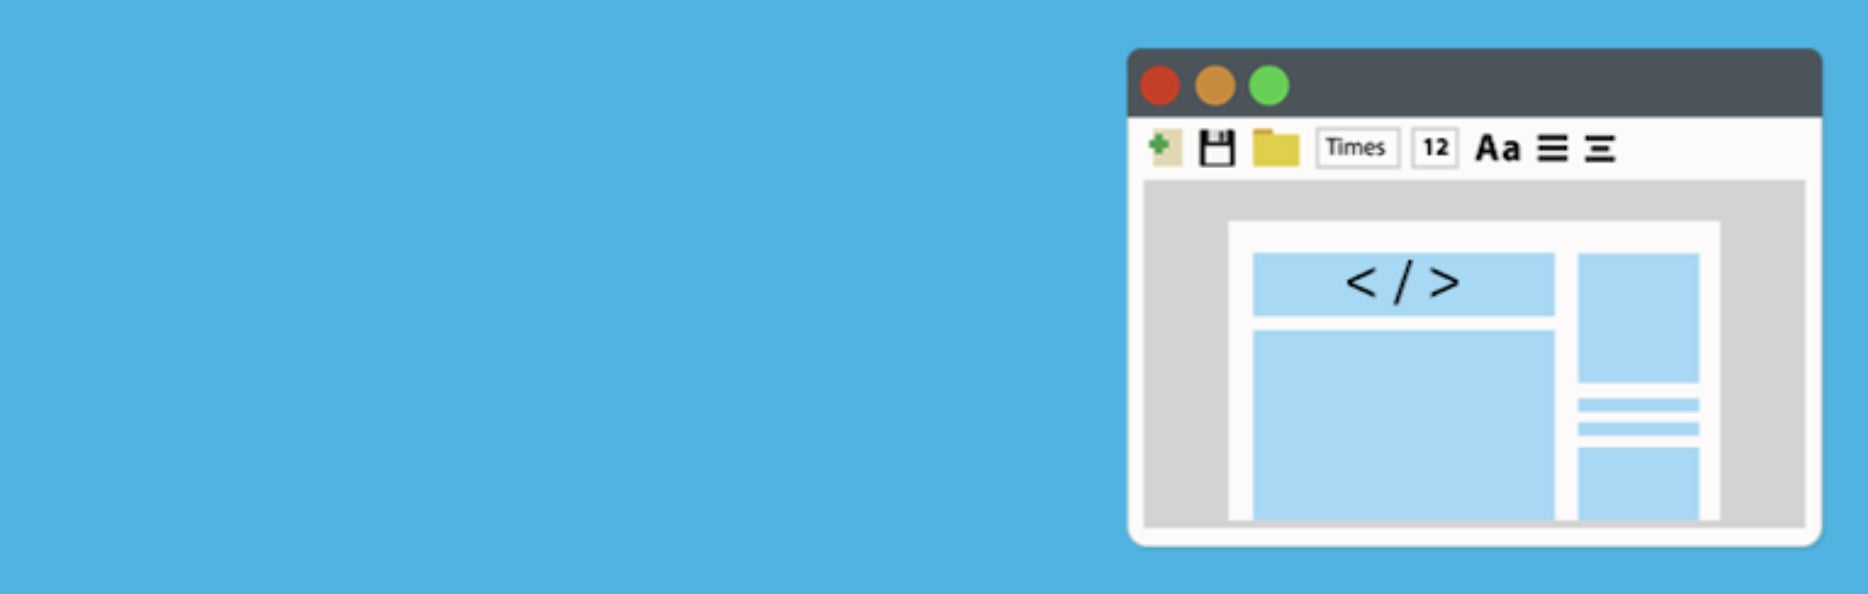 Daftar 15 Plugin Wordpress Wajib Ada di Blog untuk SEO (Edisi 2019) 21